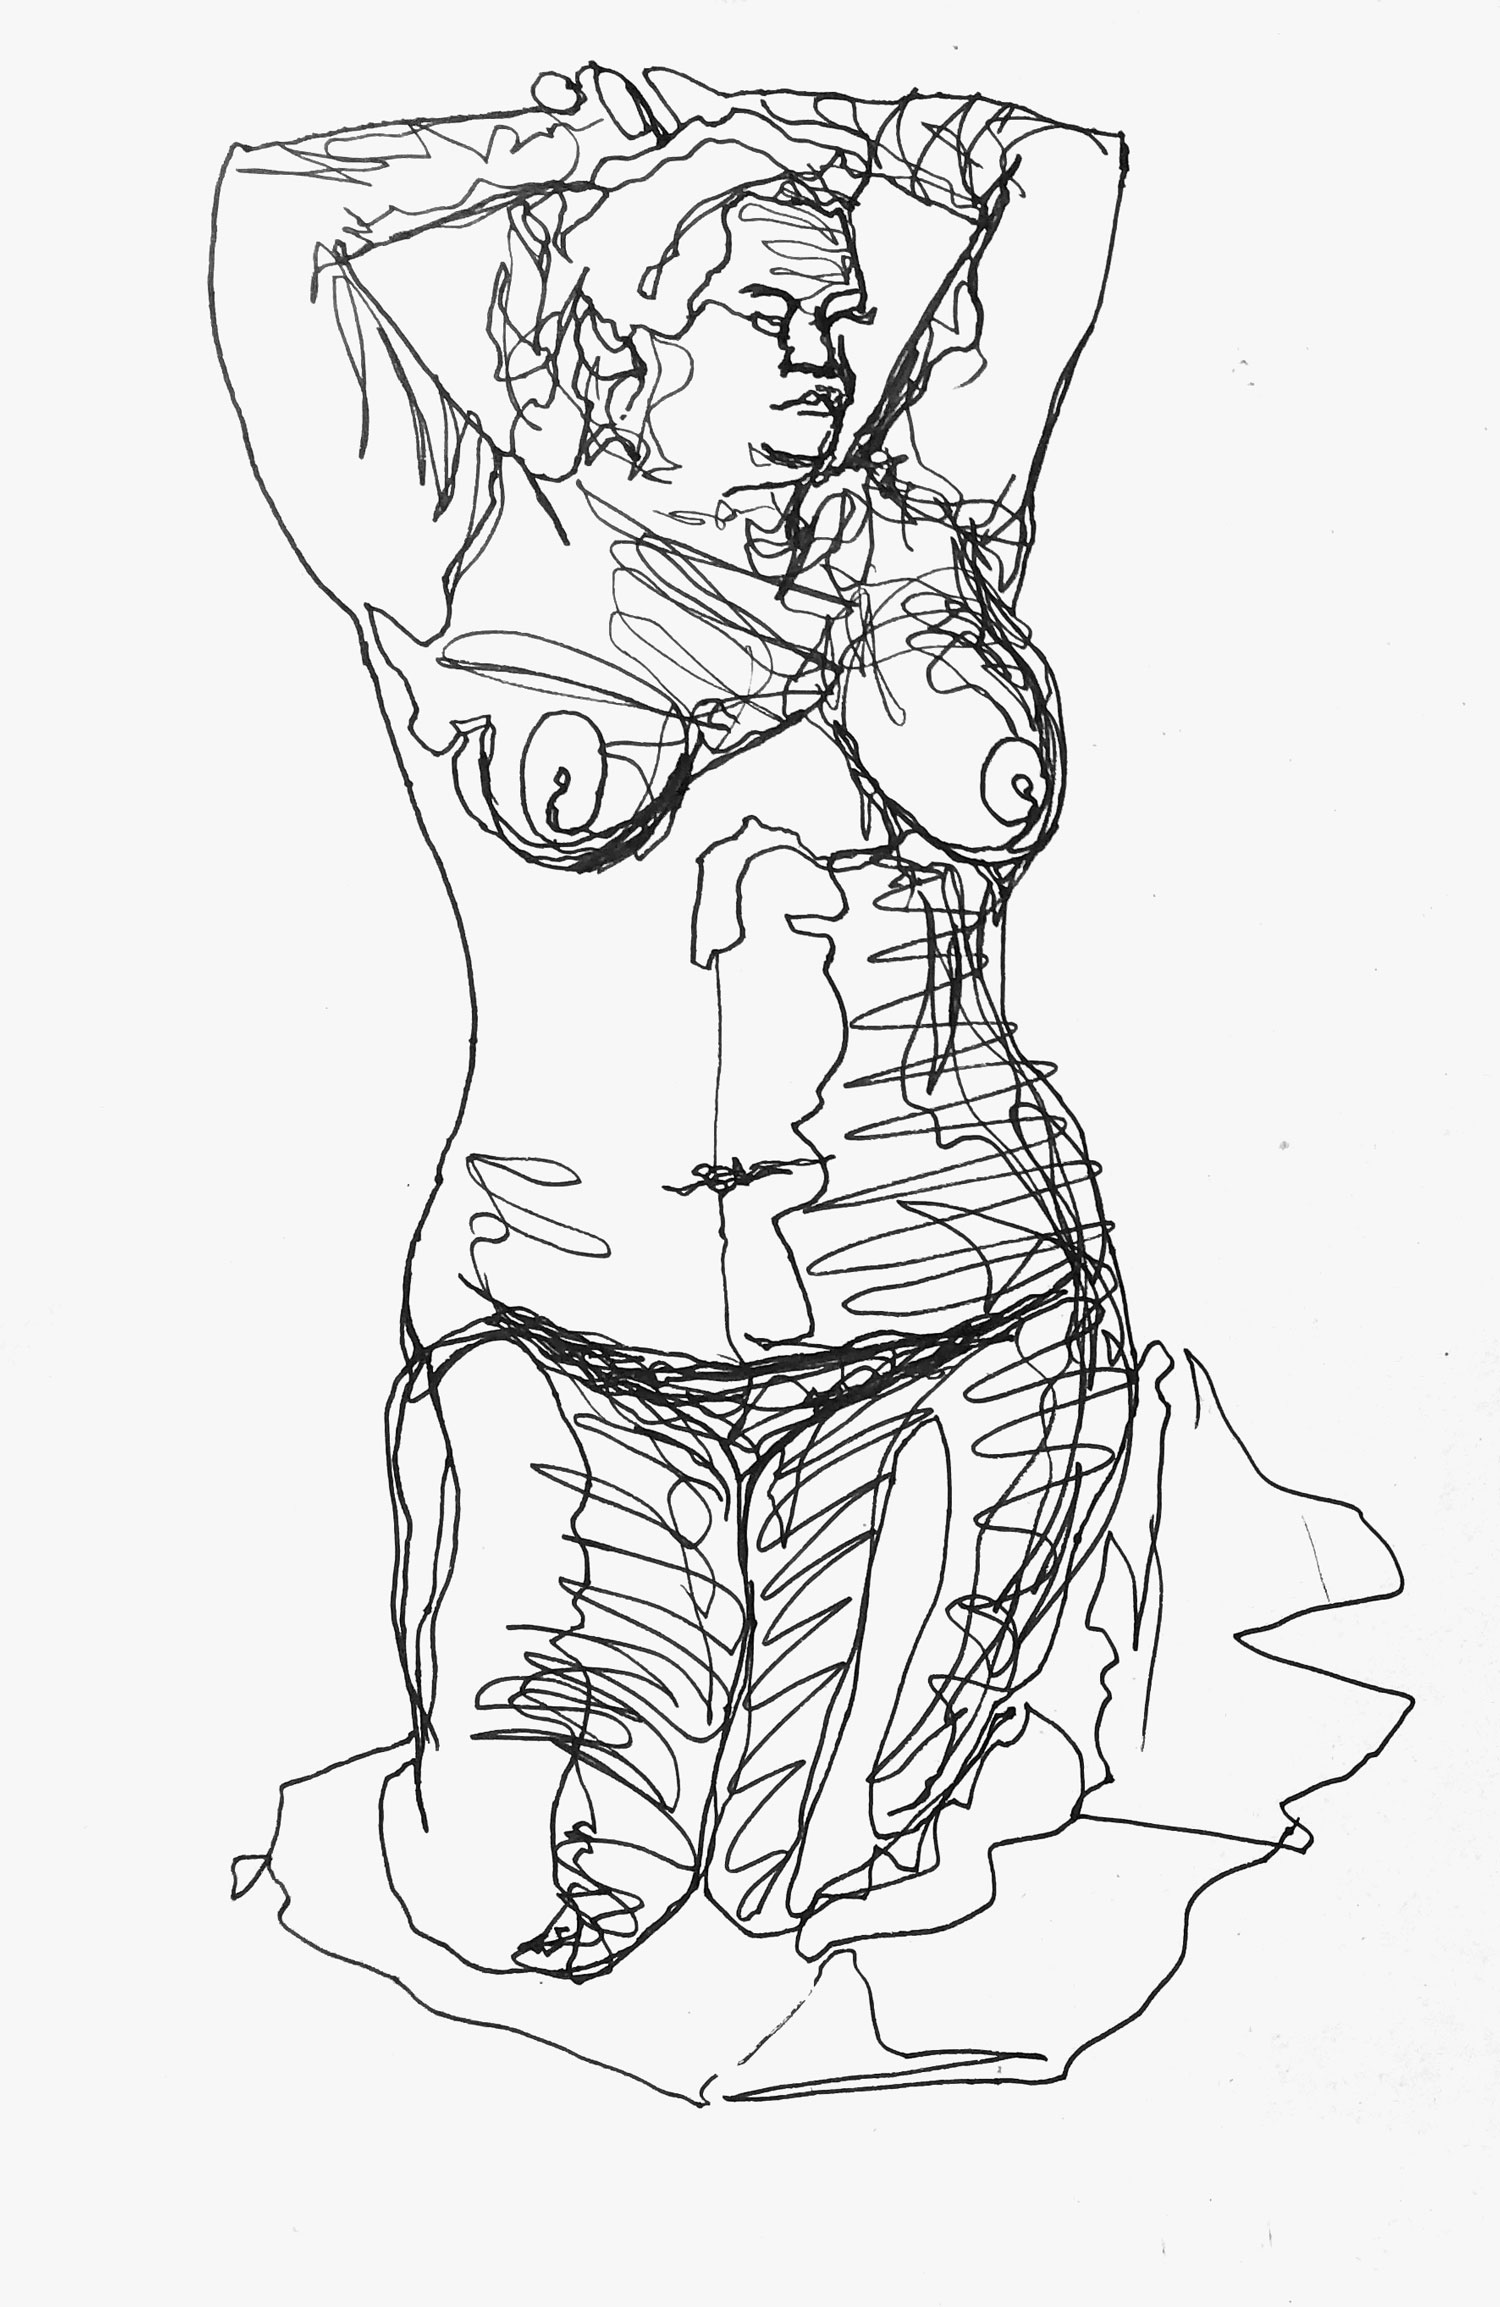 10 minute life drawing-drawing-2-10min